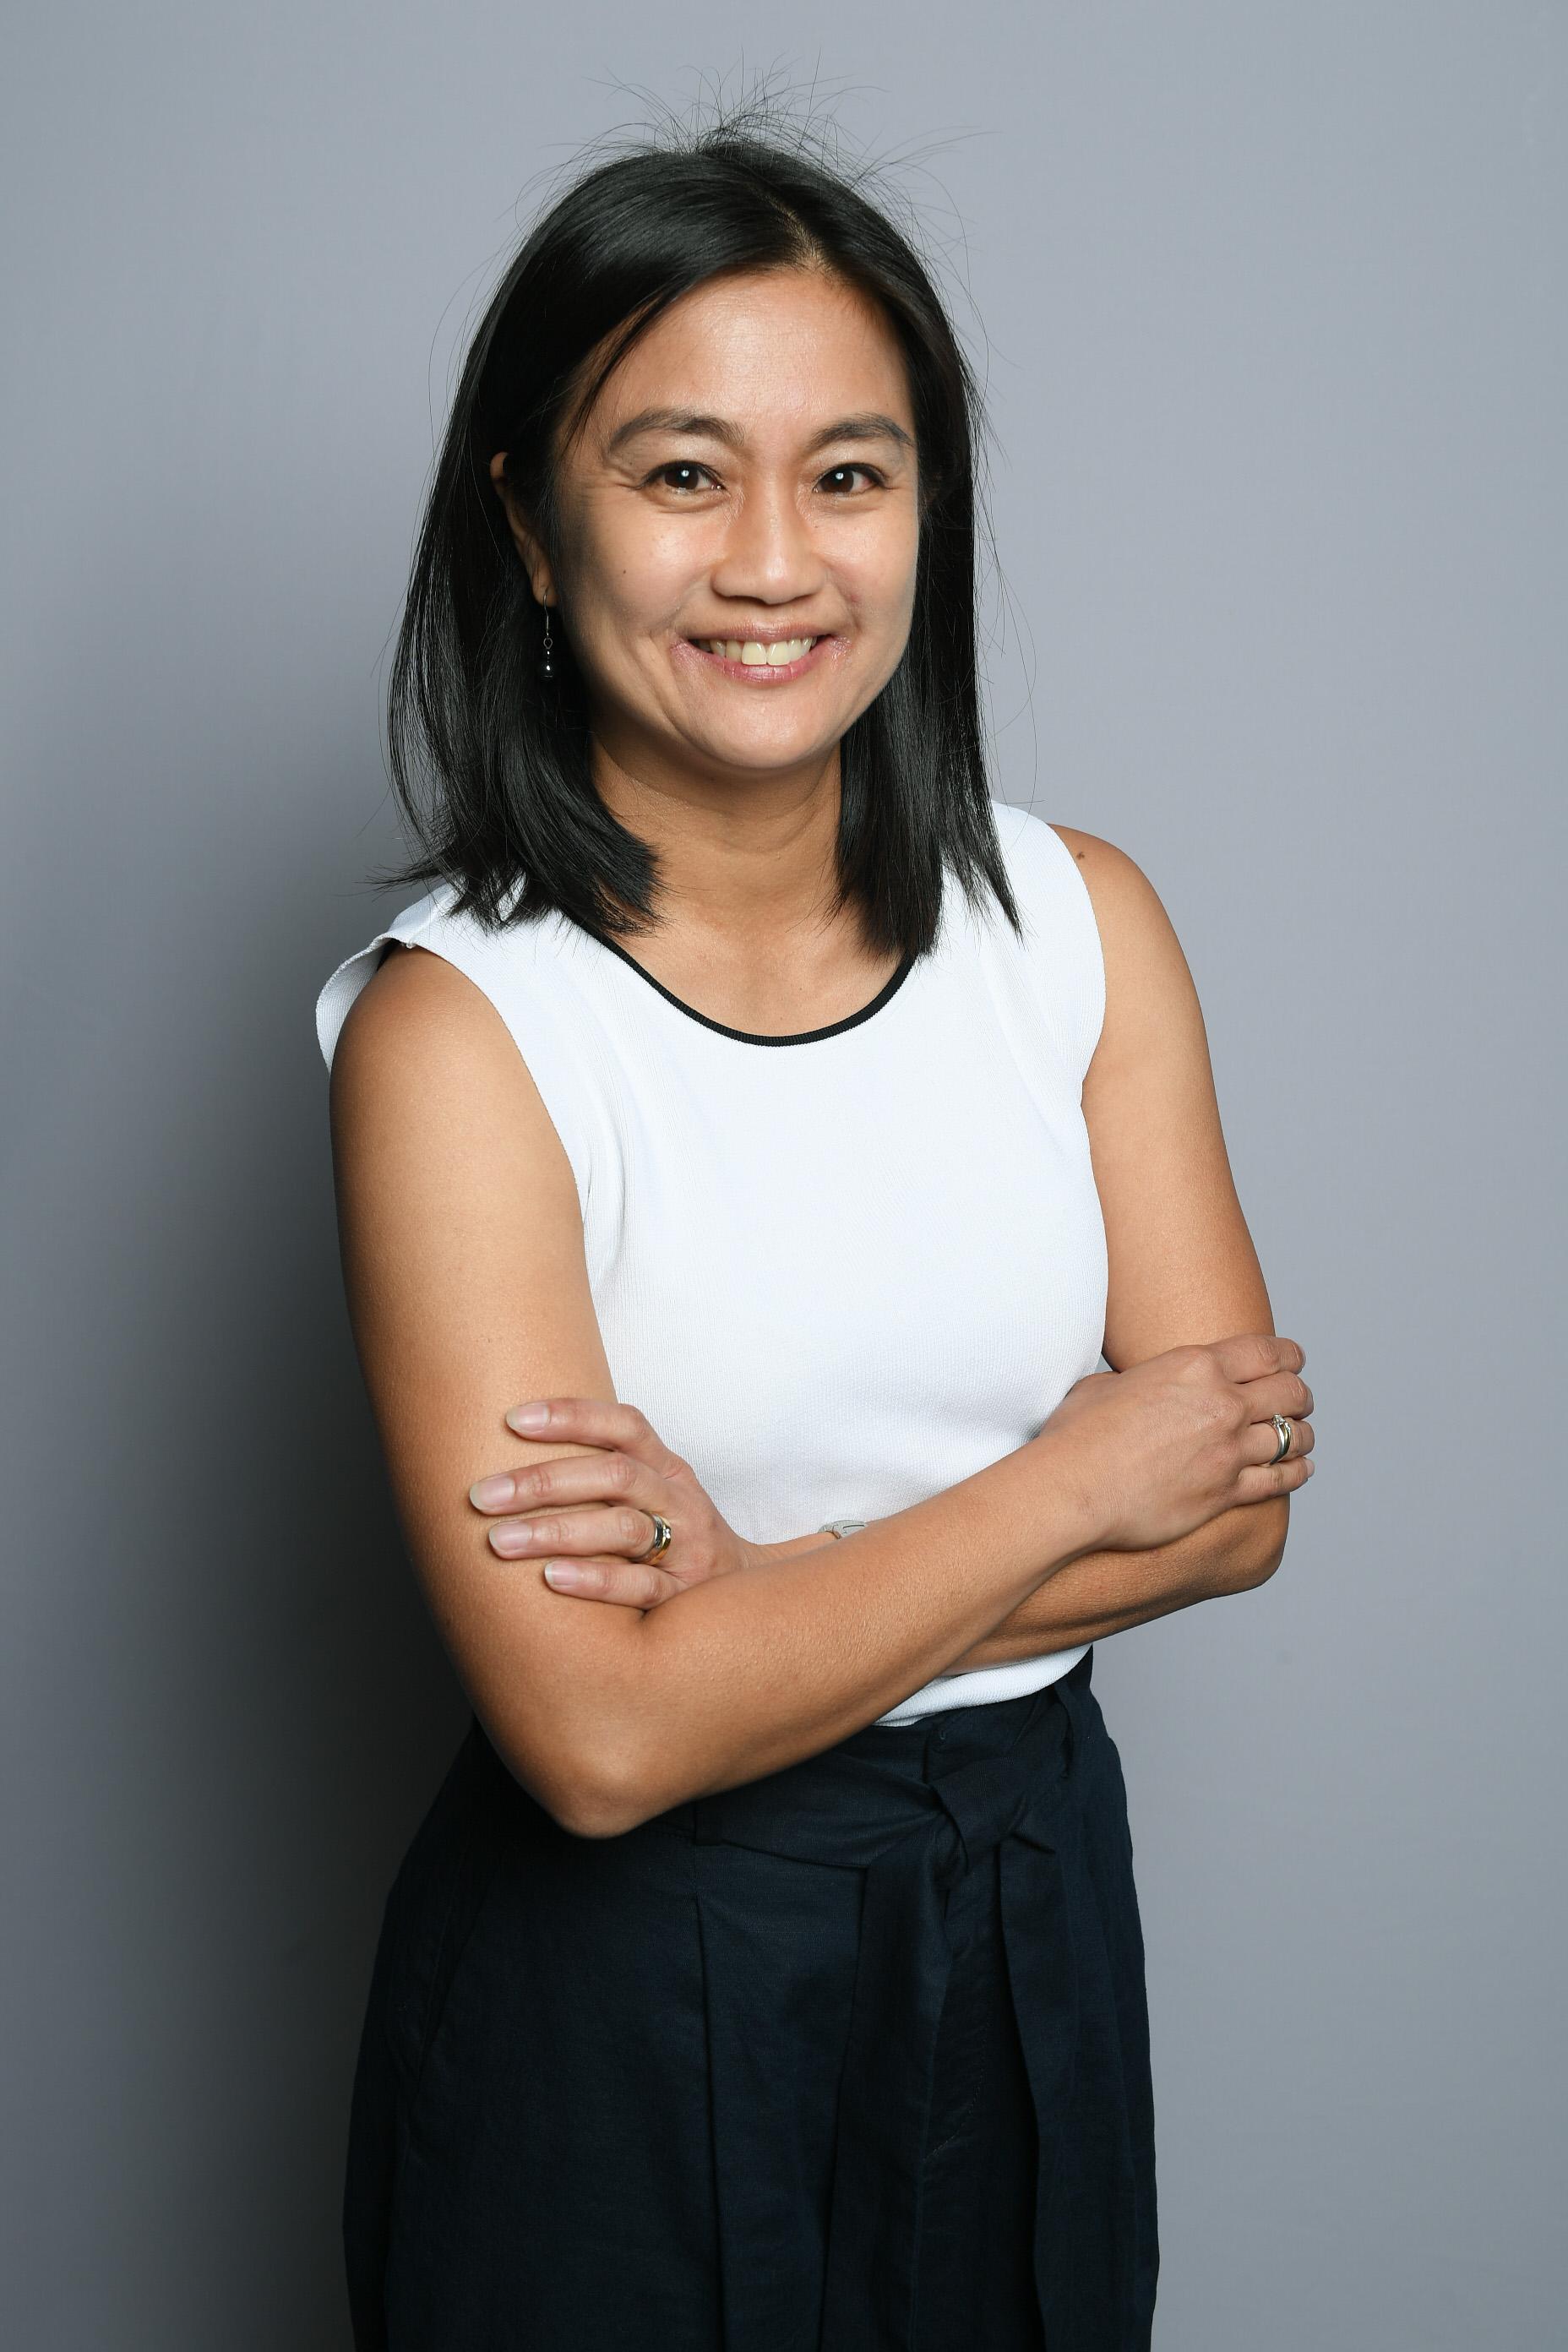 Dr Audrey Indrawati Sutanto-Adji